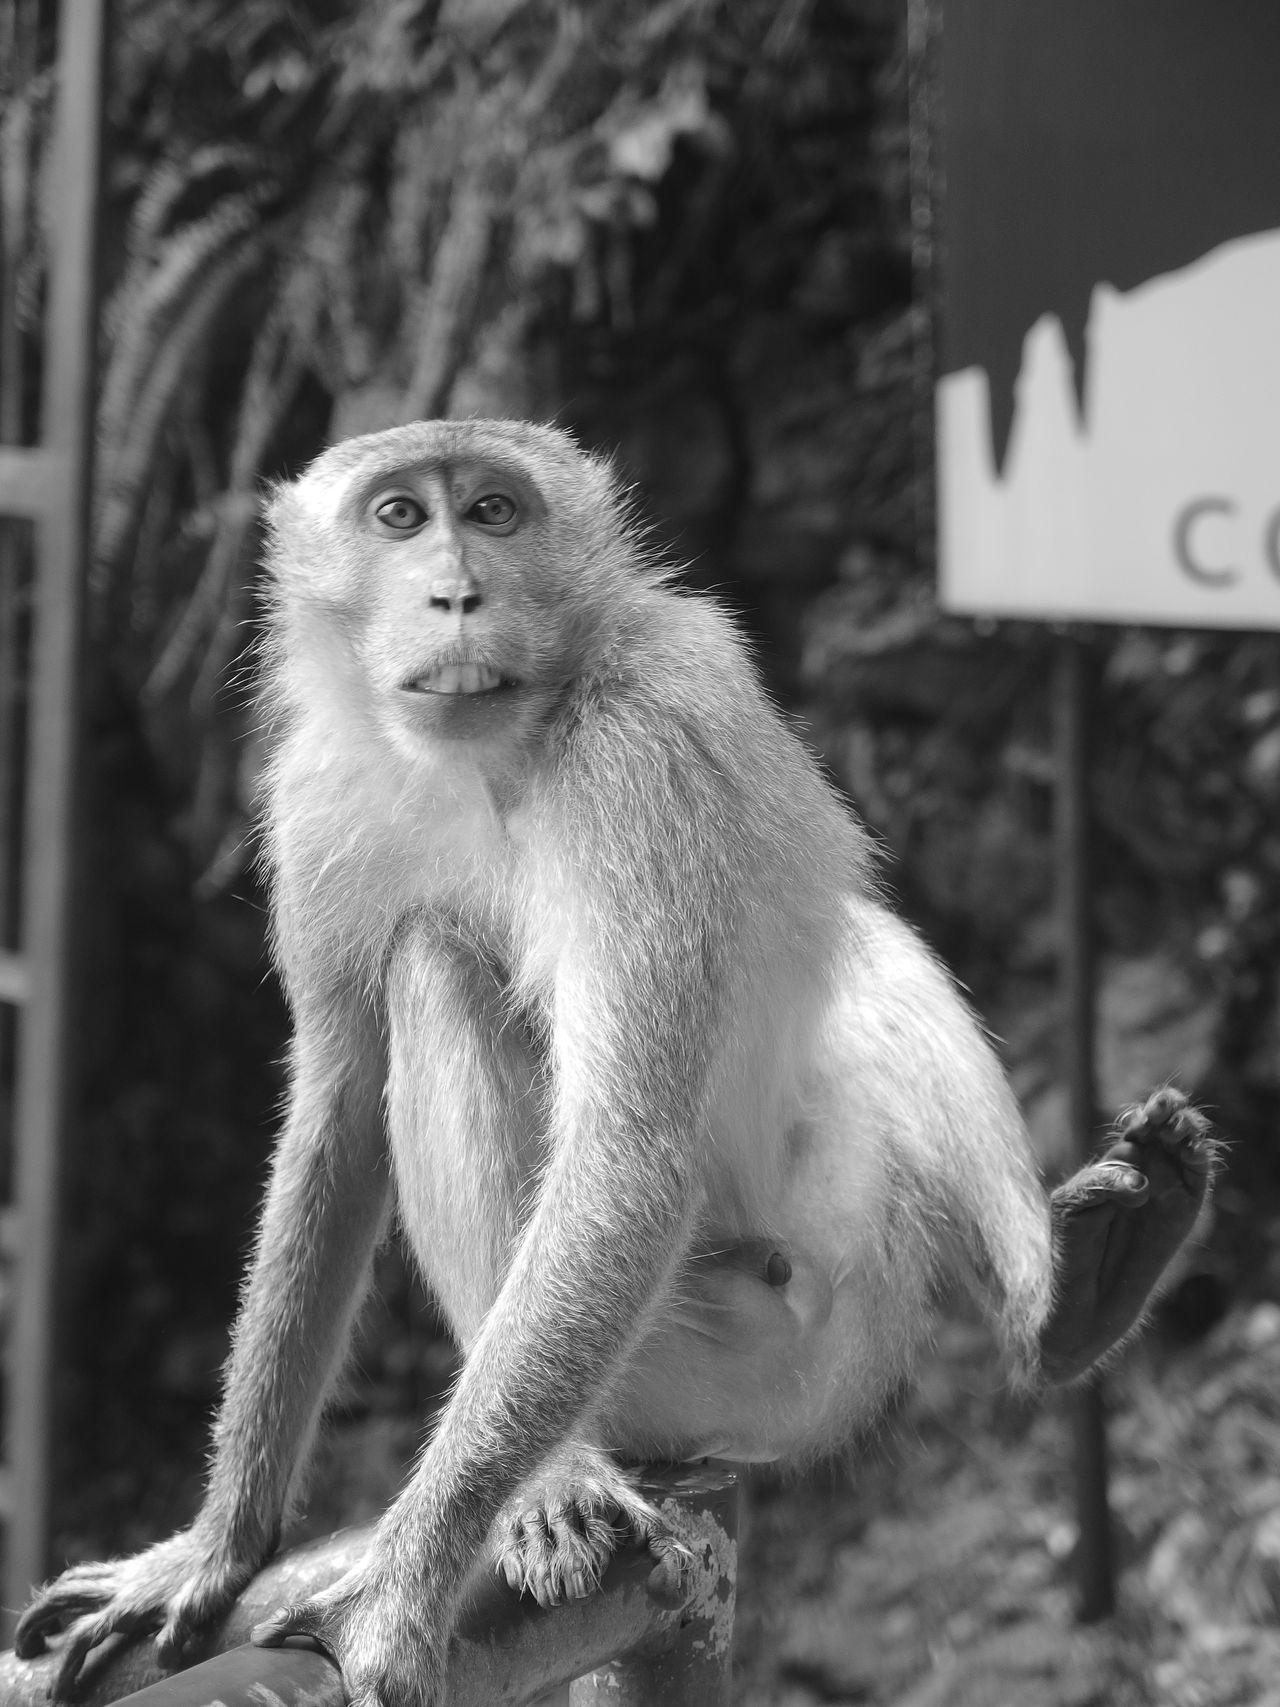 Animal Themes Batu Caves Batu Caves -Malaysia Blackandwhite Cave Monkey Monkeys One Animal Surprised What